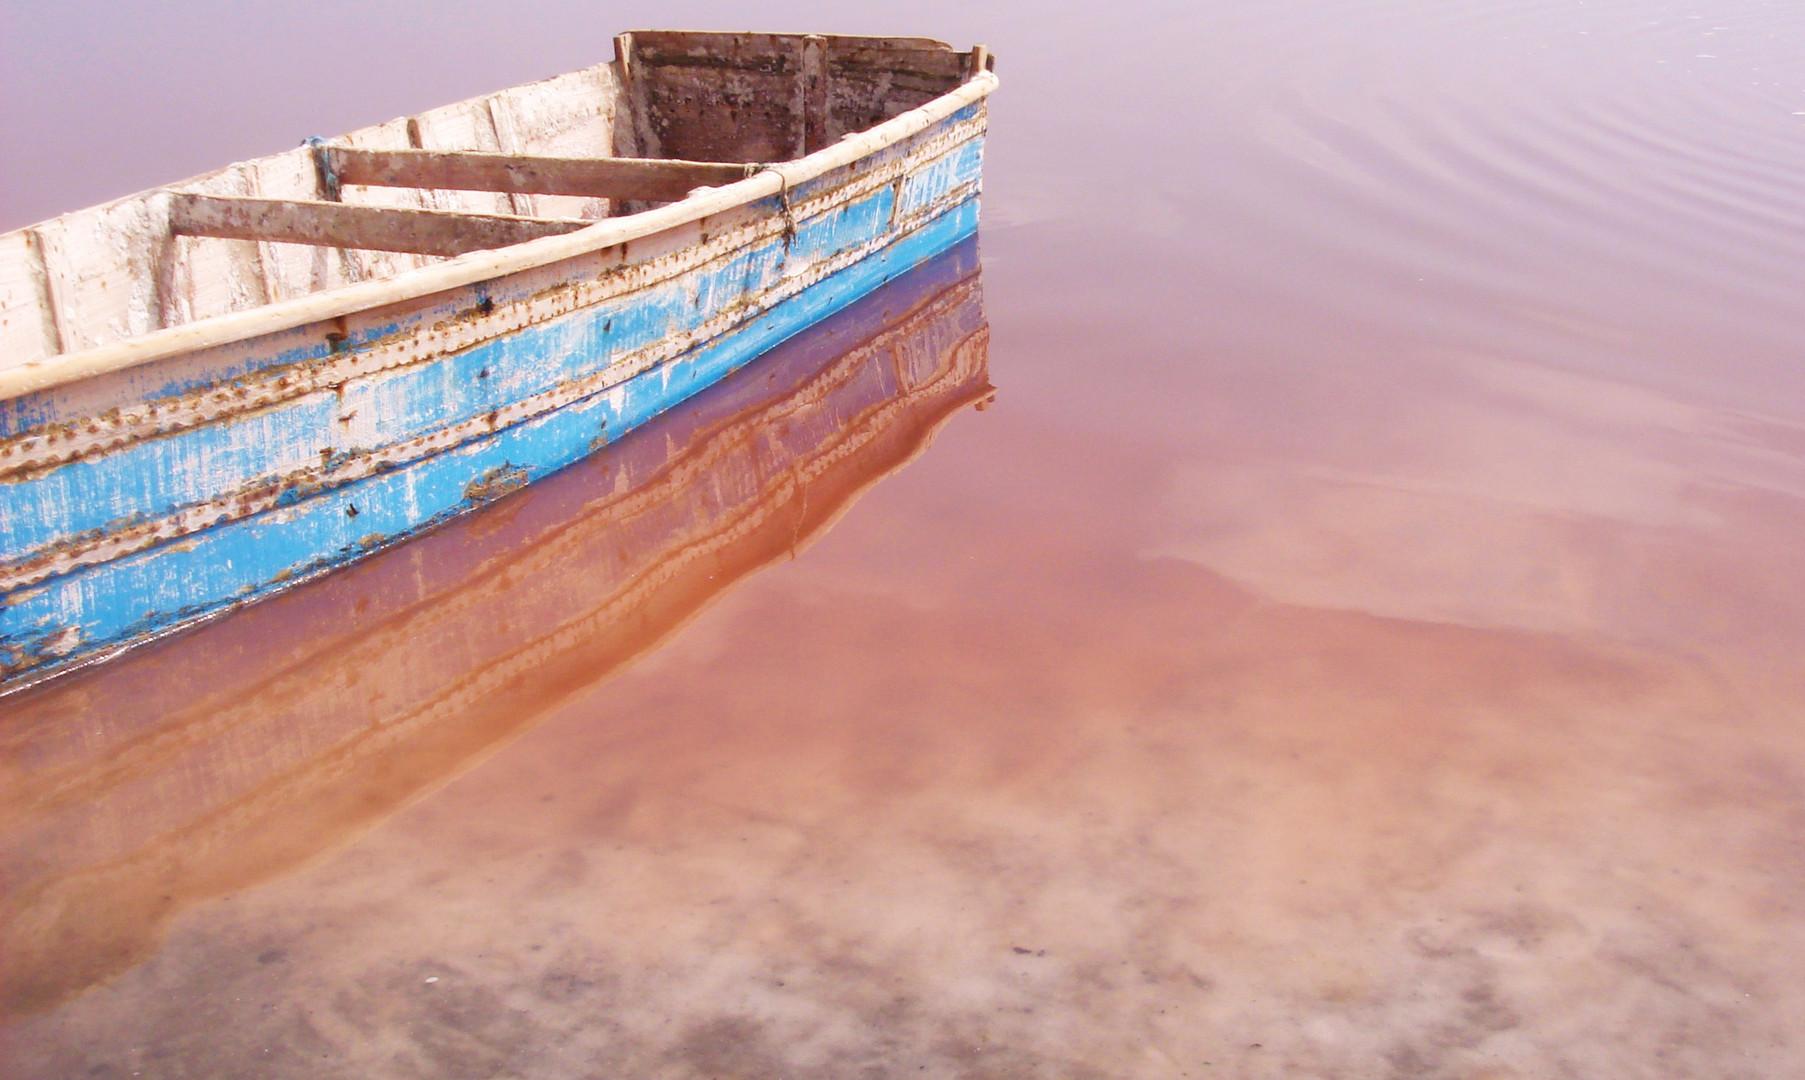 La mer rose, the pink sea